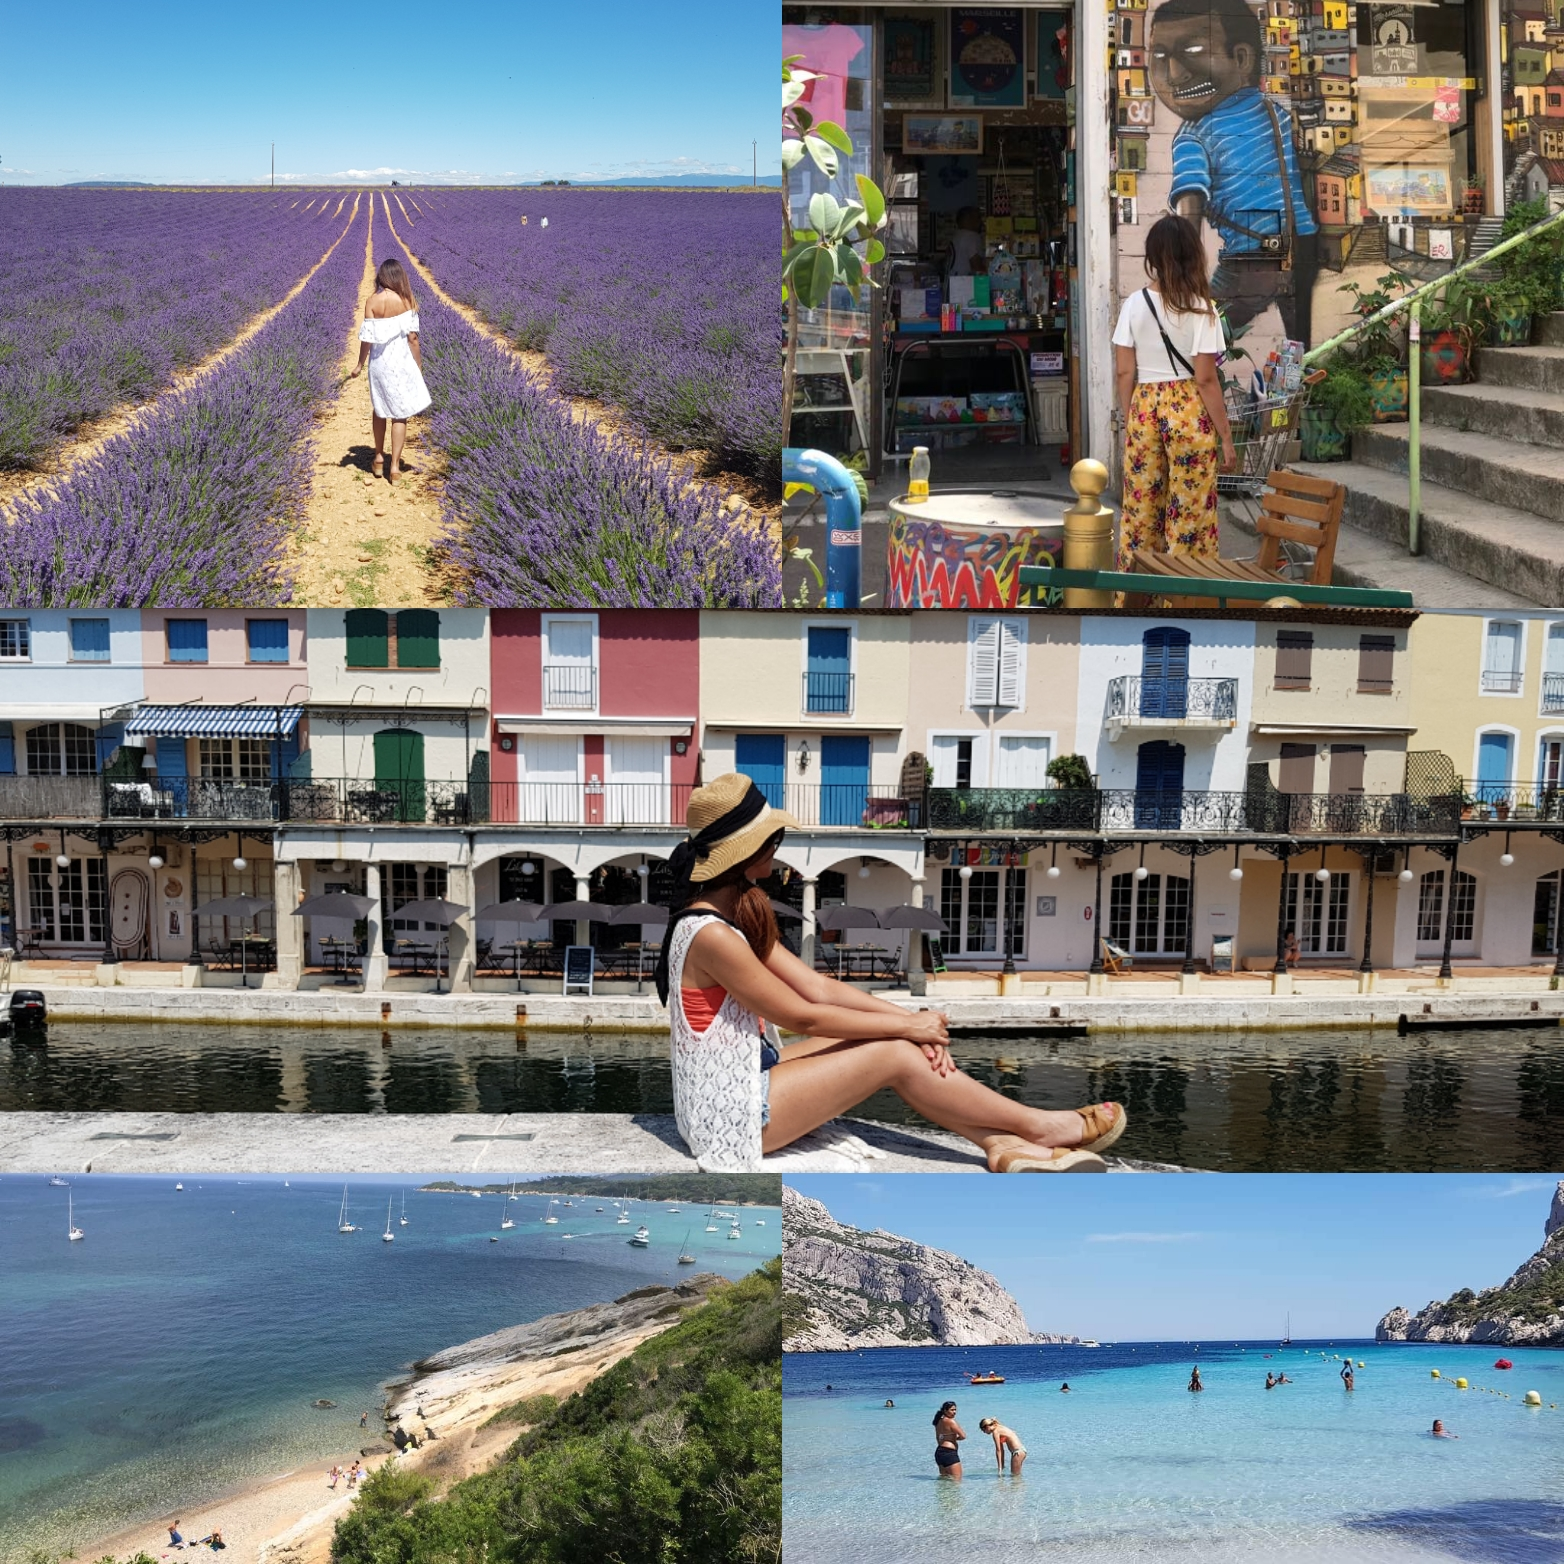 [:it]Viaggio in Provenza: i luoghi più belli [:in]TRAVEL TO PROVENCE: THE MOST BEAUTIFUL PLACES[:]